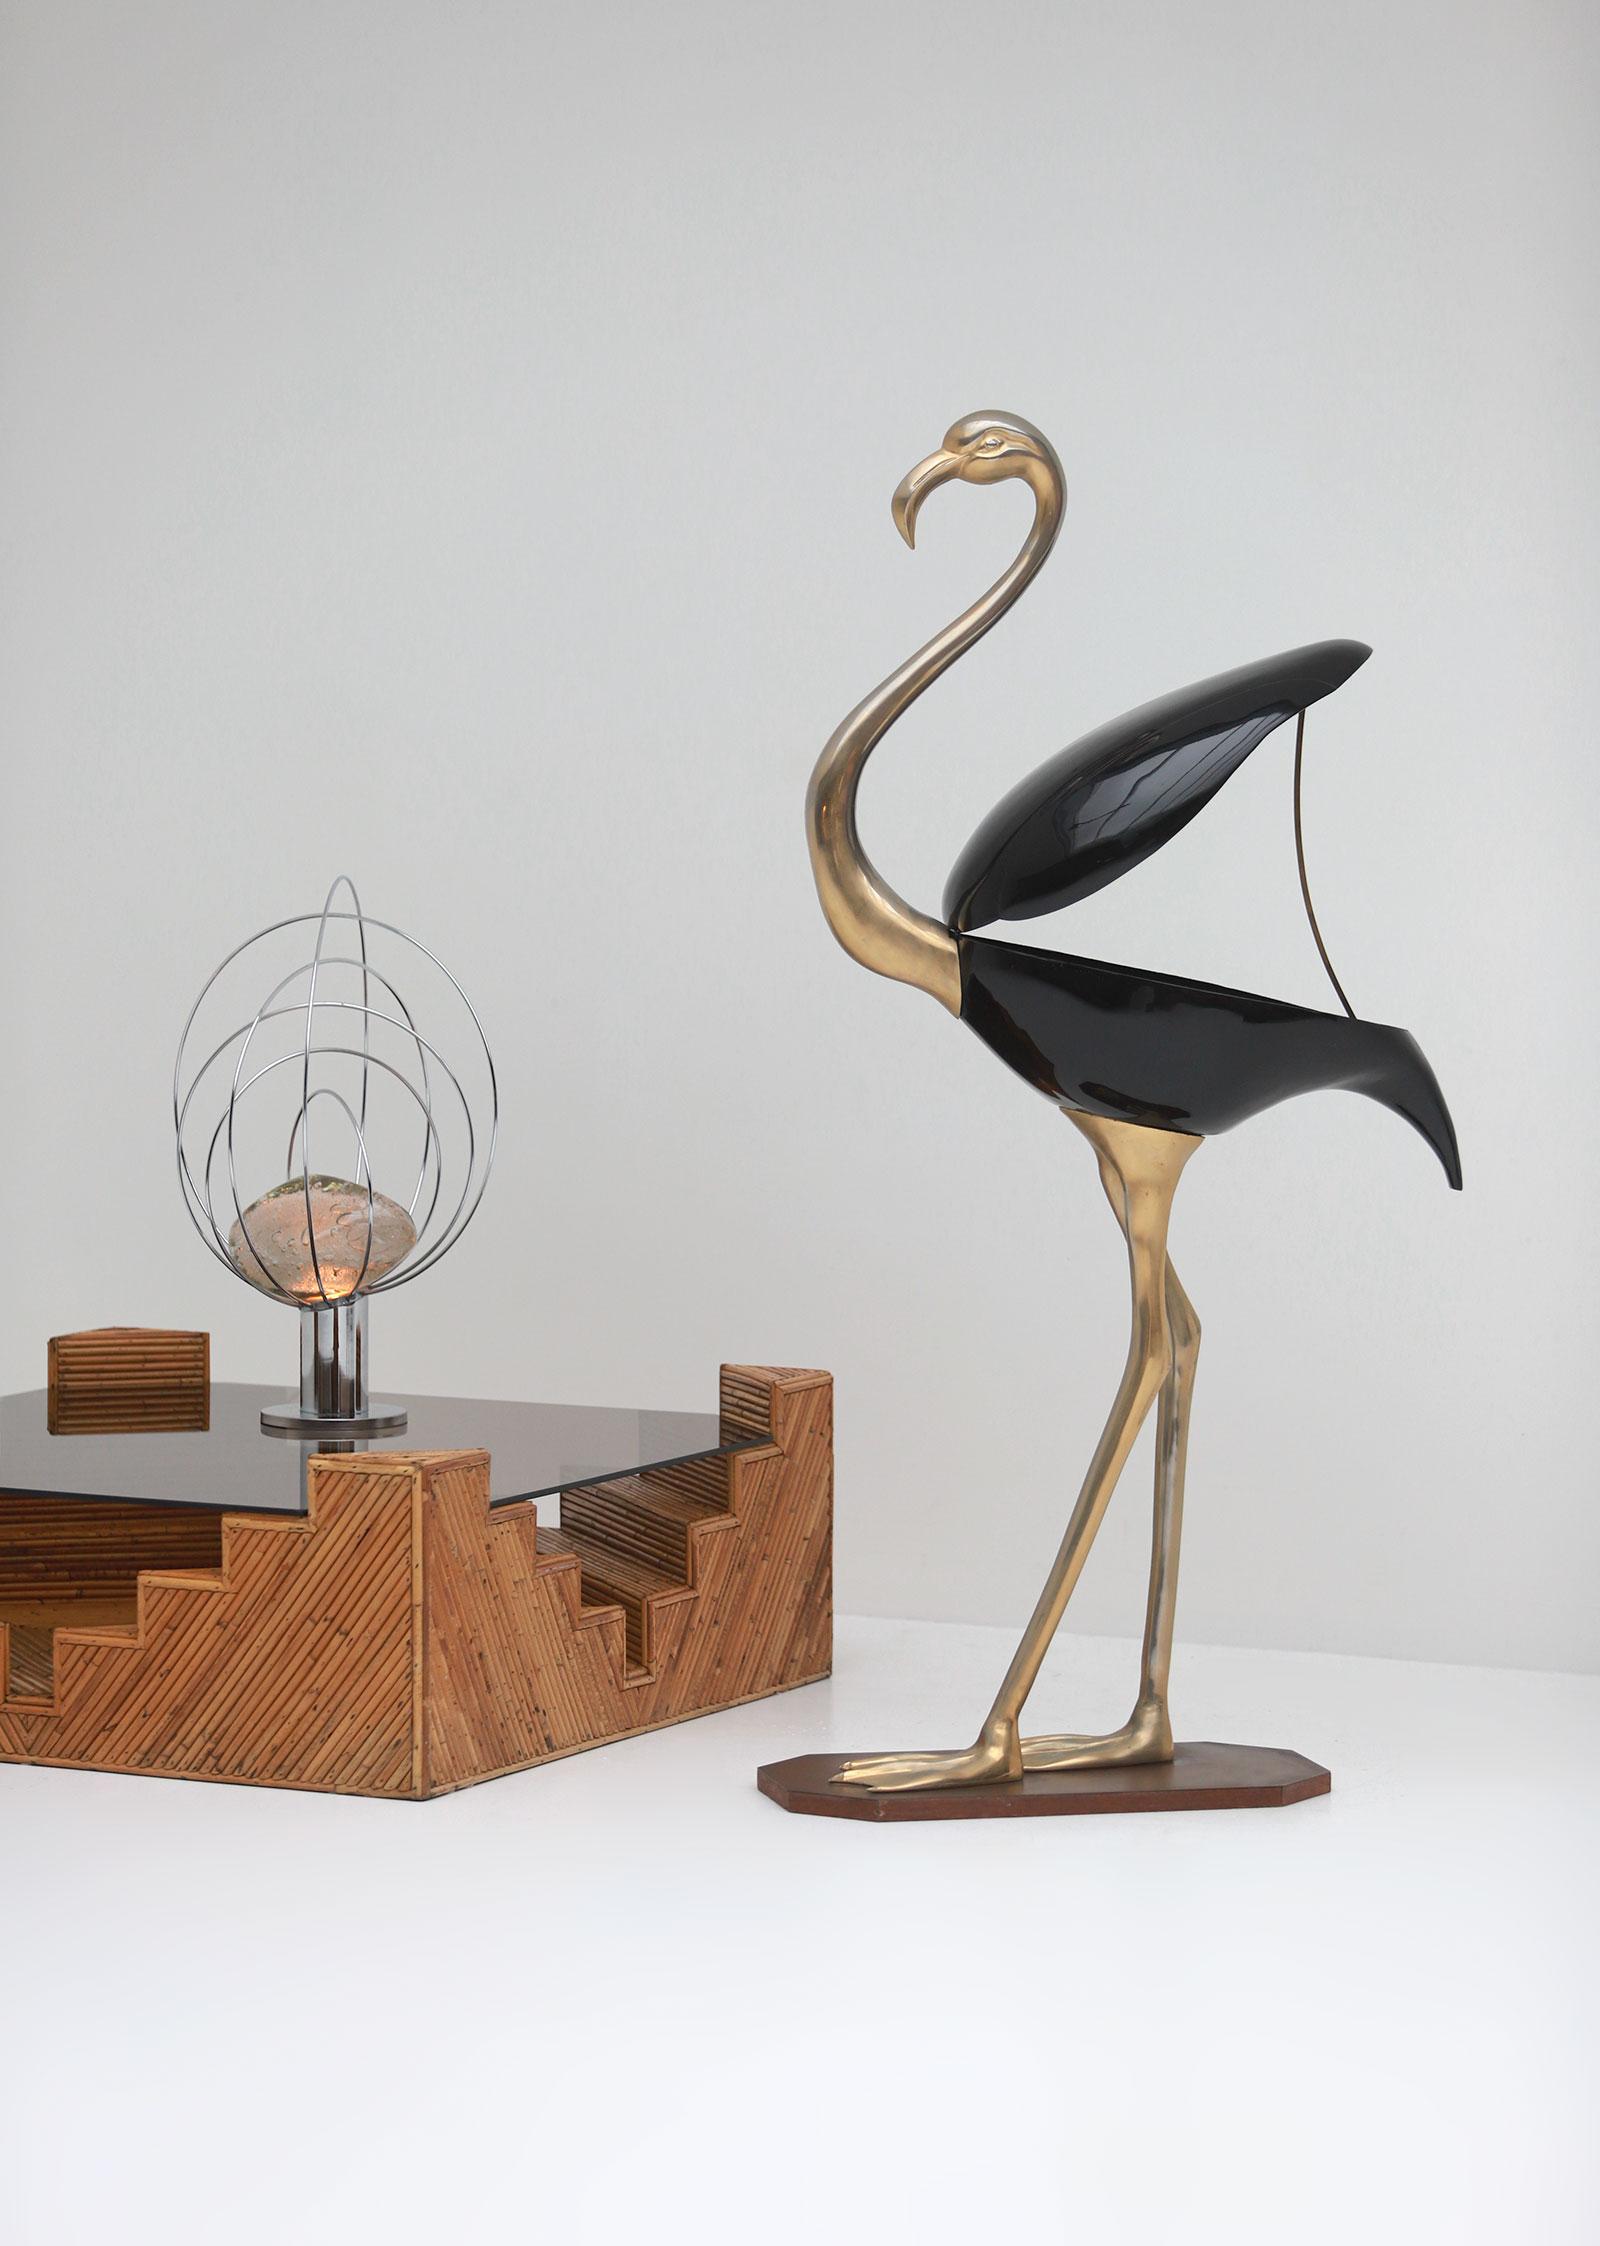 Fondica Lifesize Brass Flamingo 1970simage 4